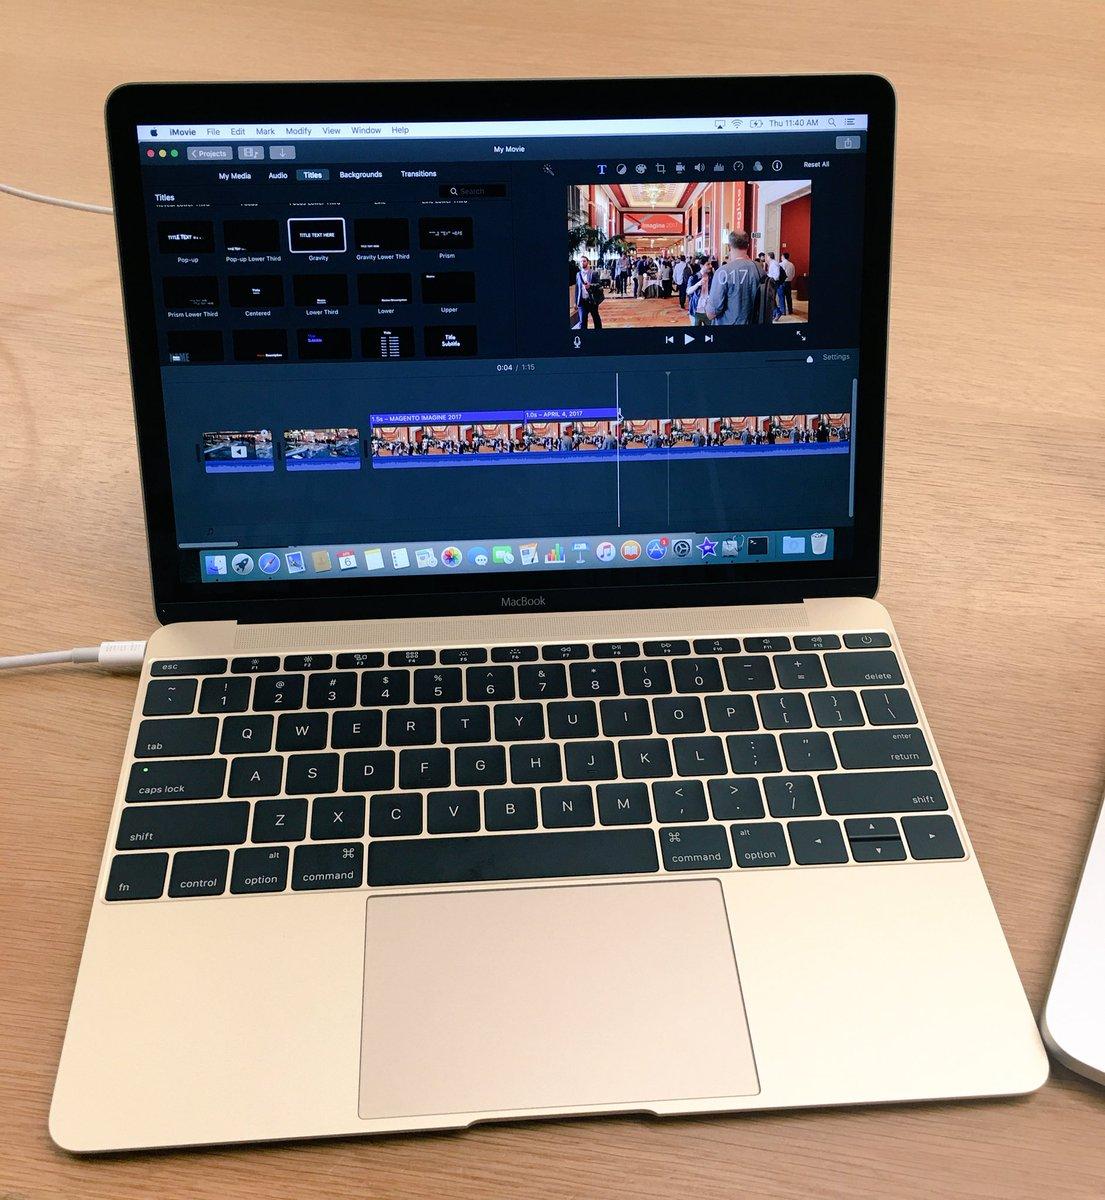 max_pronko: Guess what? Work in progress... #MagentoImagine https://t.co/okaU0TDtcr